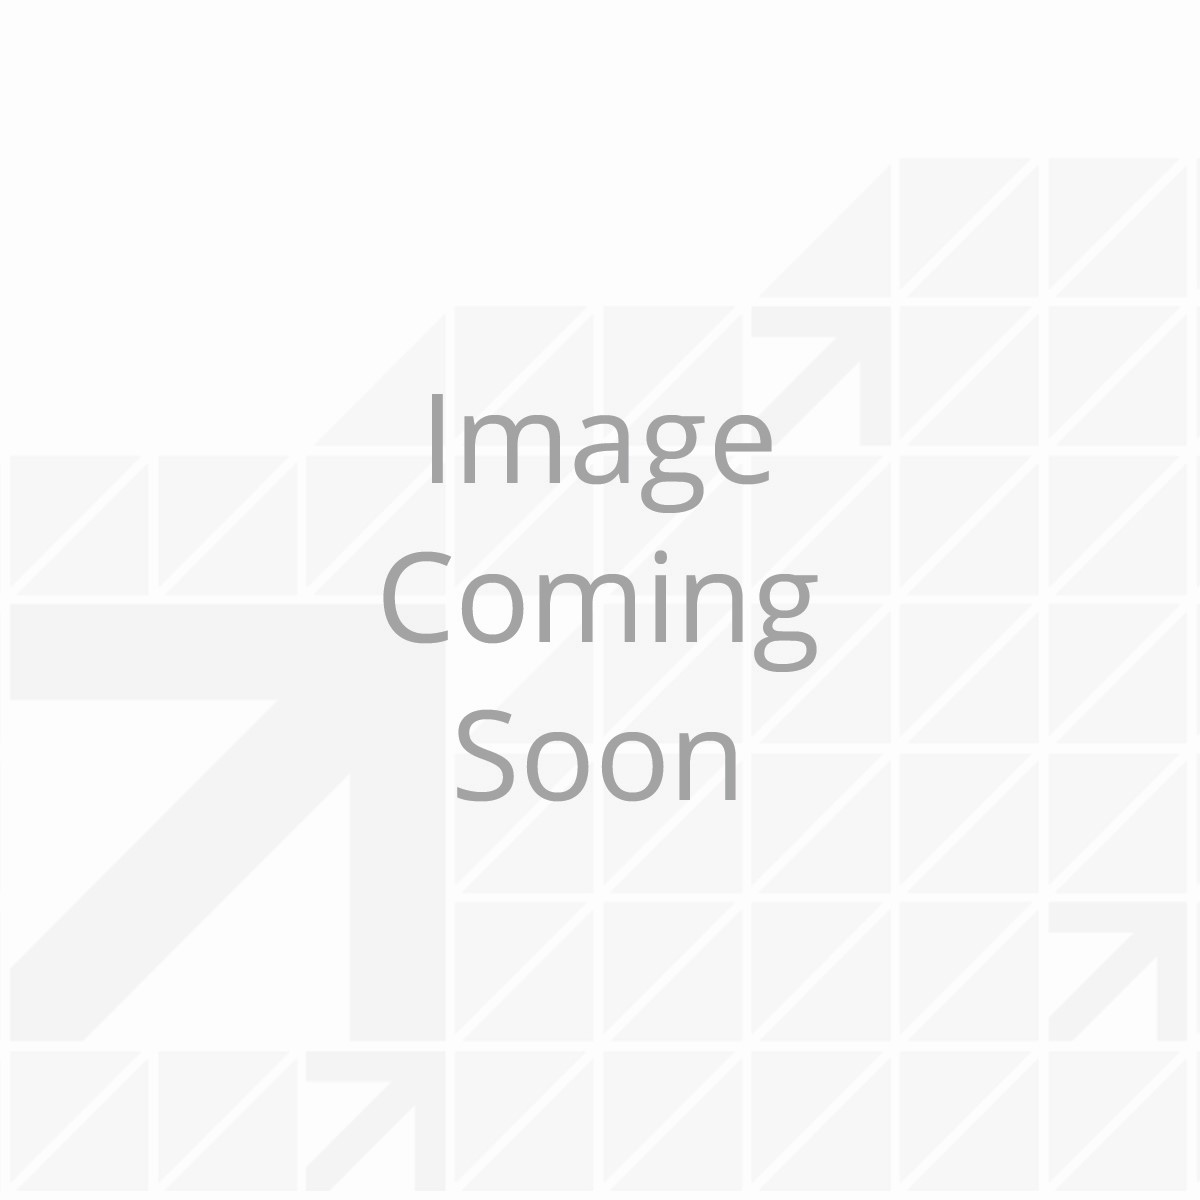 5121 ALPHATHANE 100% Solids Self-Leveling Sealant, Beige (9.8 Oz. Tube)